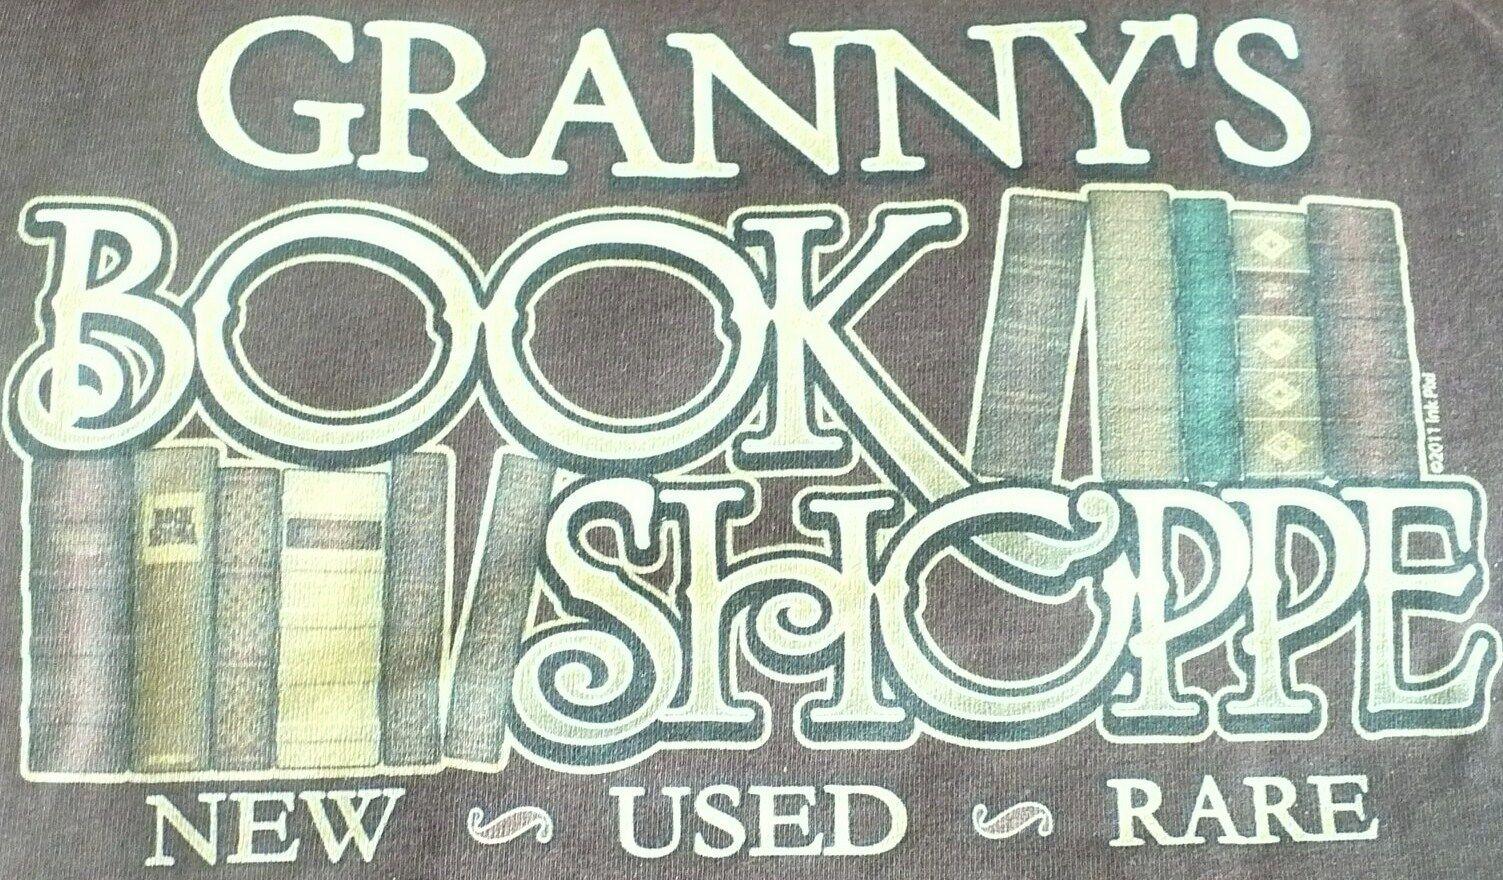 grannysbookstore